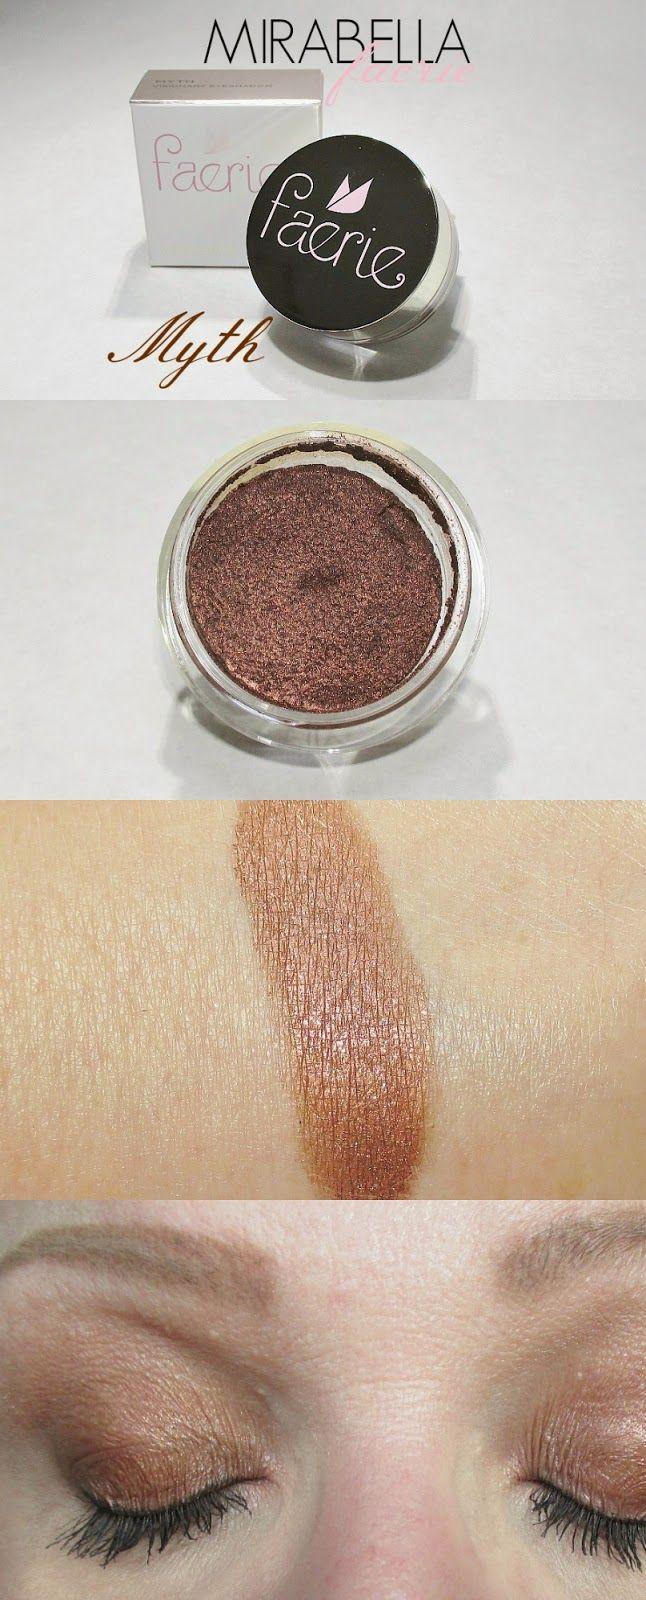 Icy Nails: Mirabella Myth Visionary Long Wear Eye Shadow Review and swatches and eye look. #mirabella #myth #prsample #beauty #thebeautycouncil #bblogger